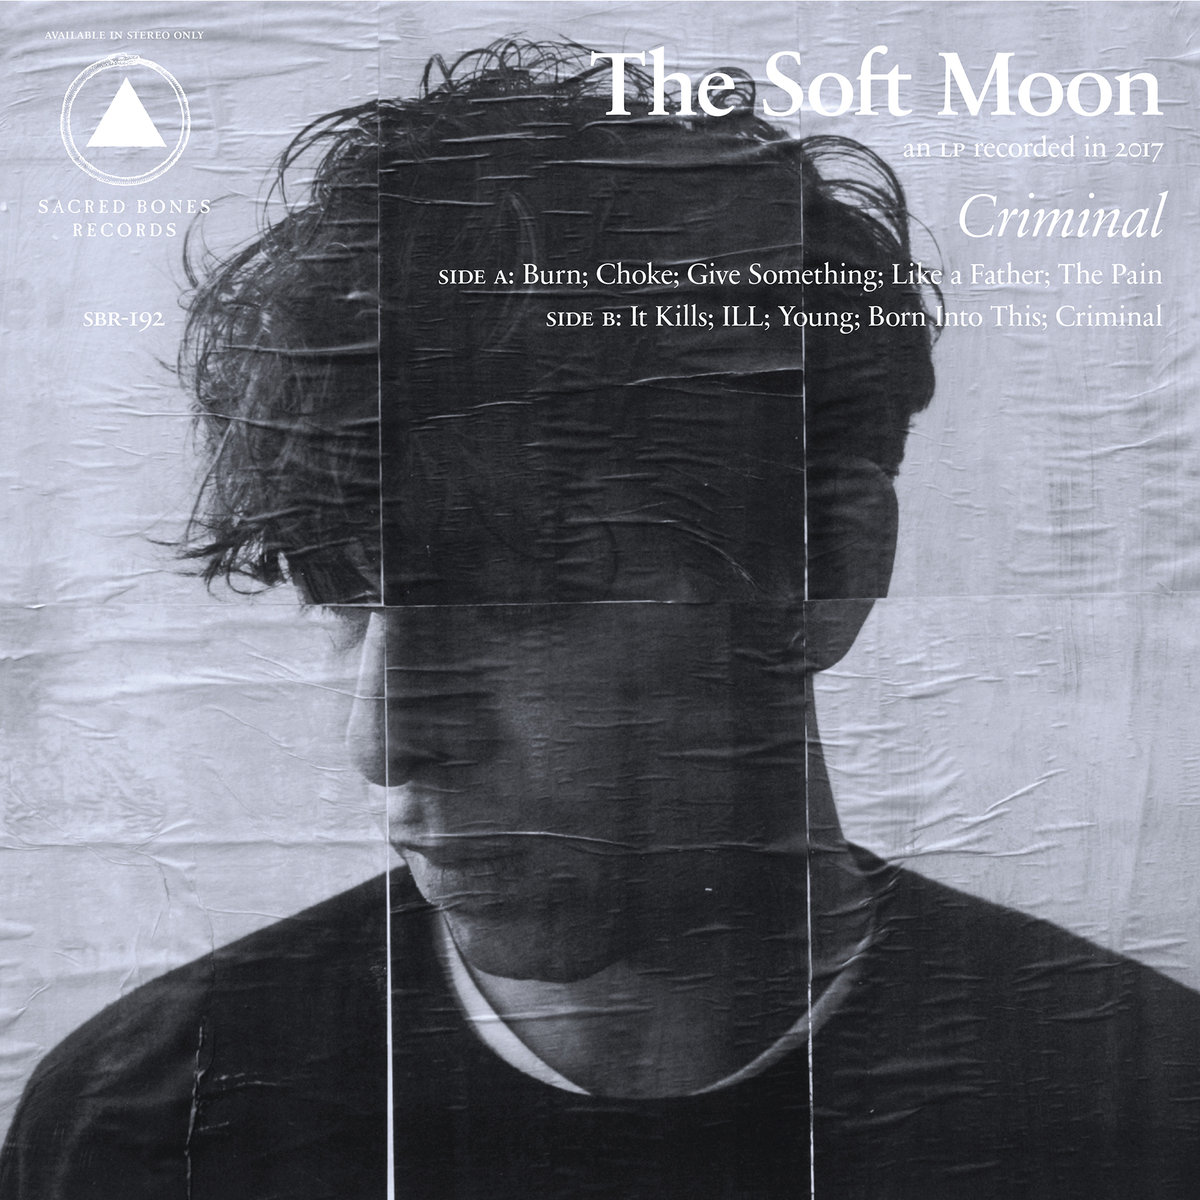 The Soft Moon new album Criminal